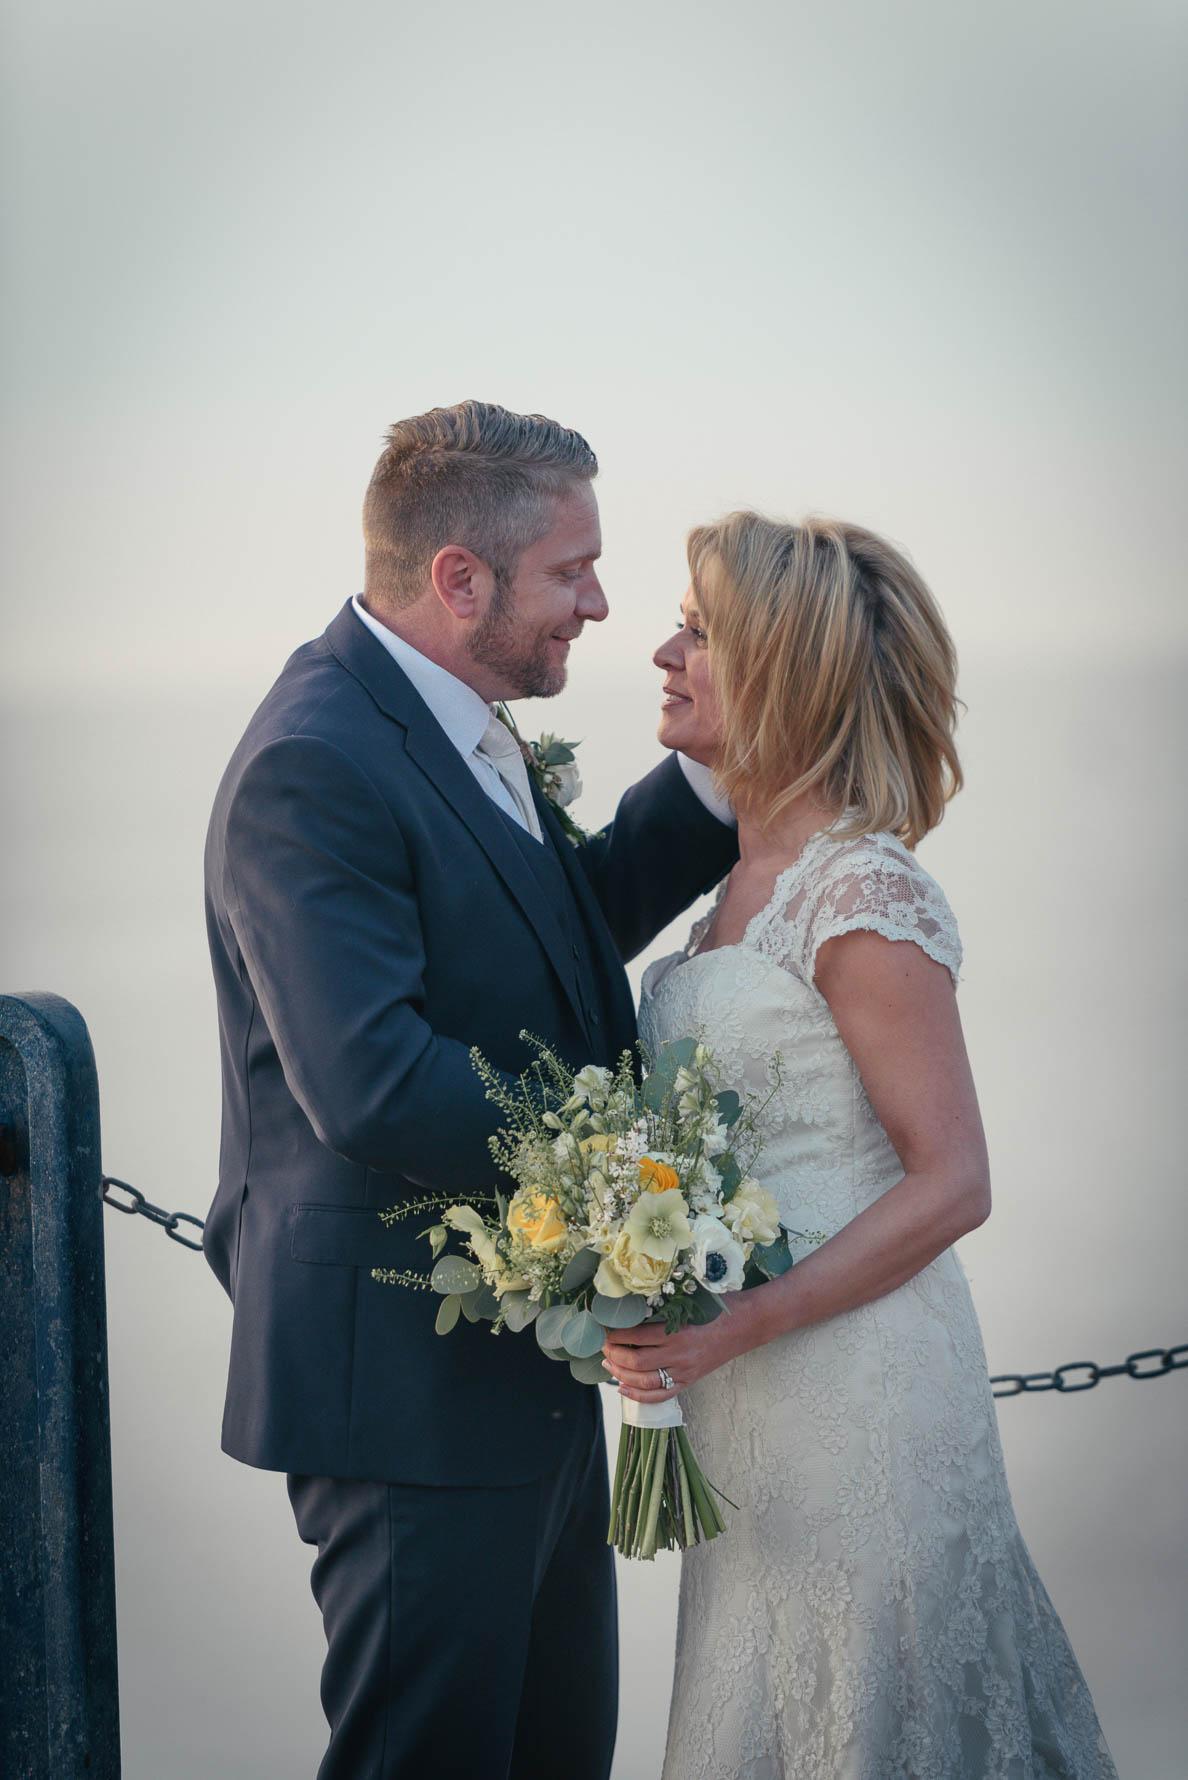 Wedding Photographer East Quay Venue-29.jpg